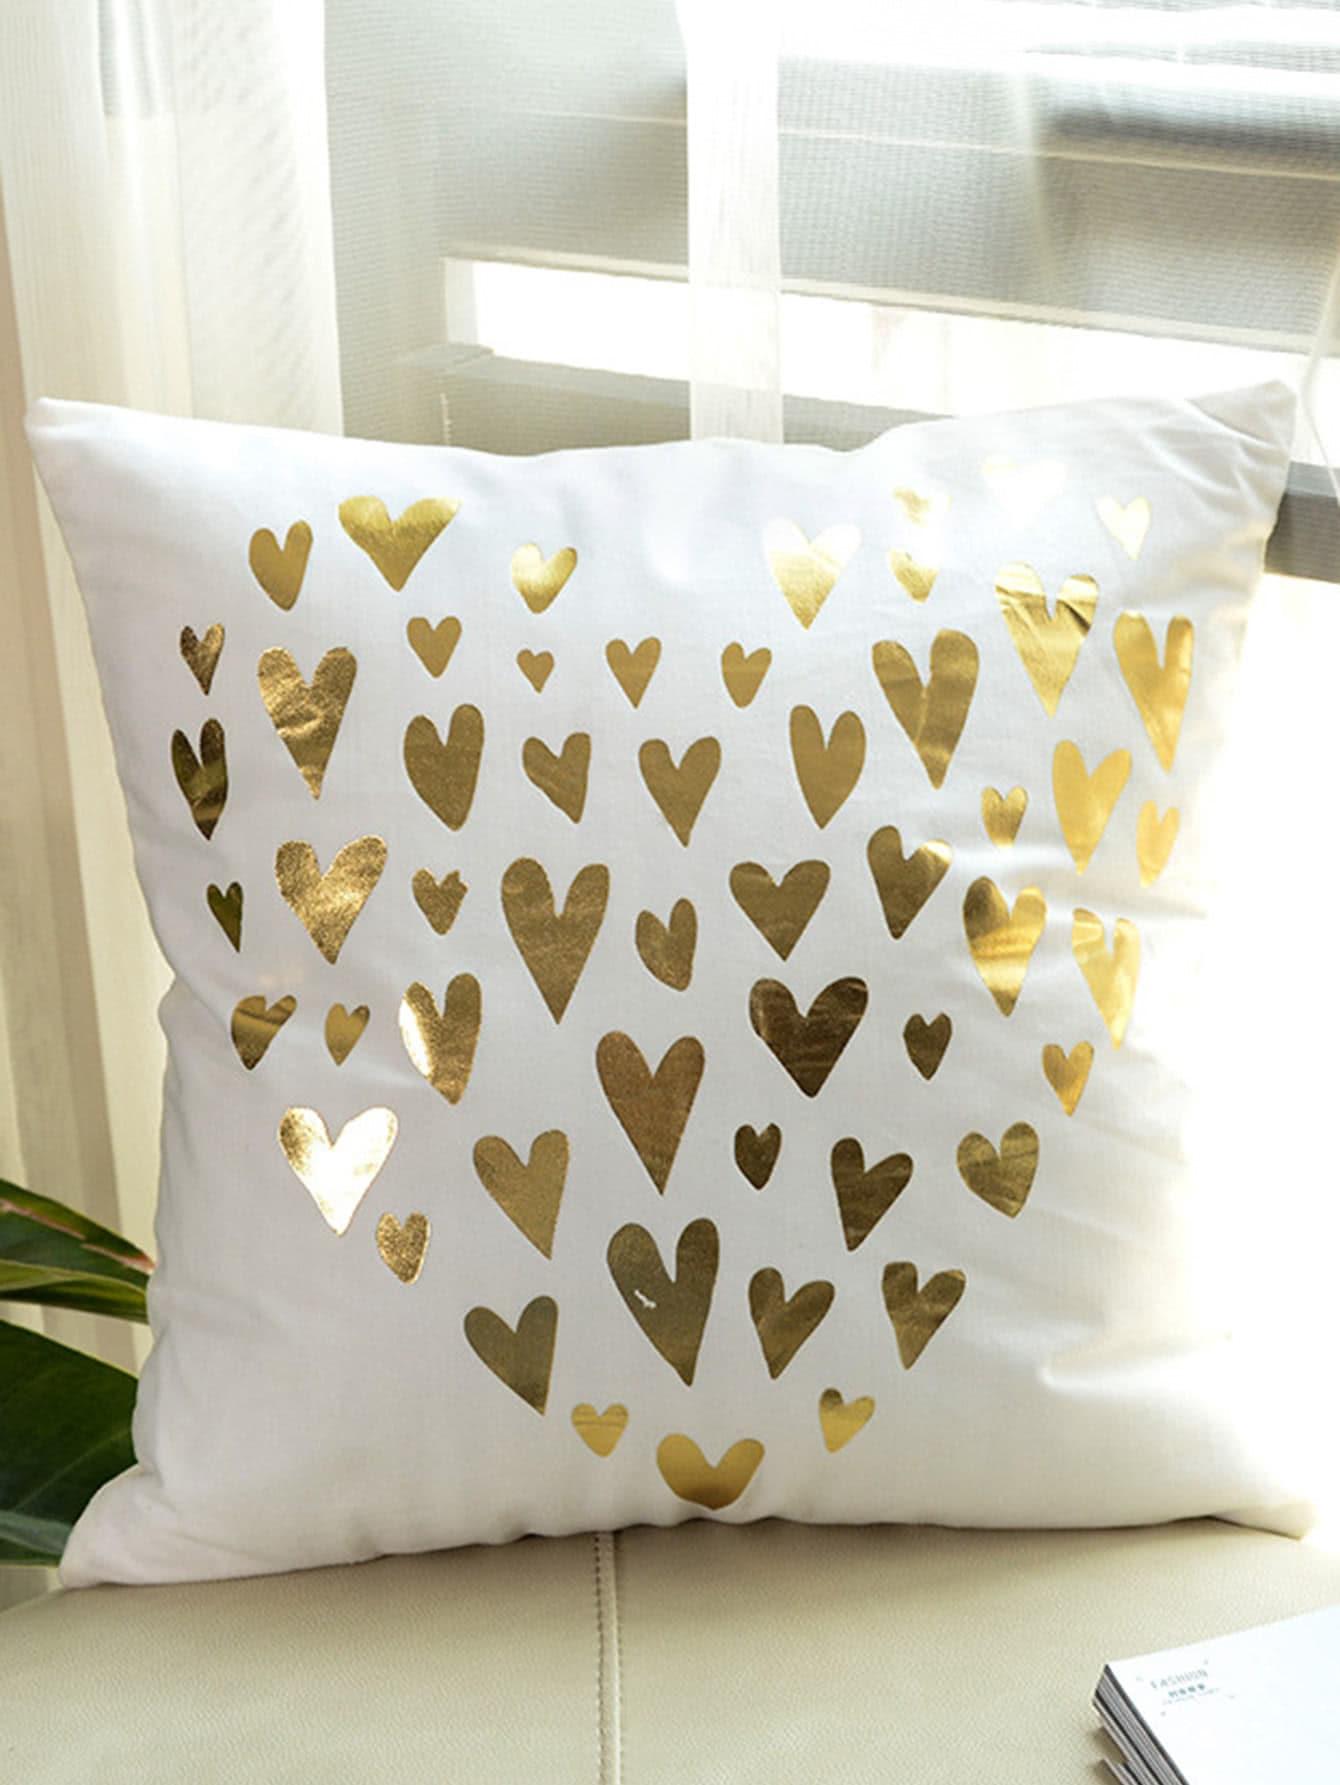 Heart Print Decorative Pillowcase Cover